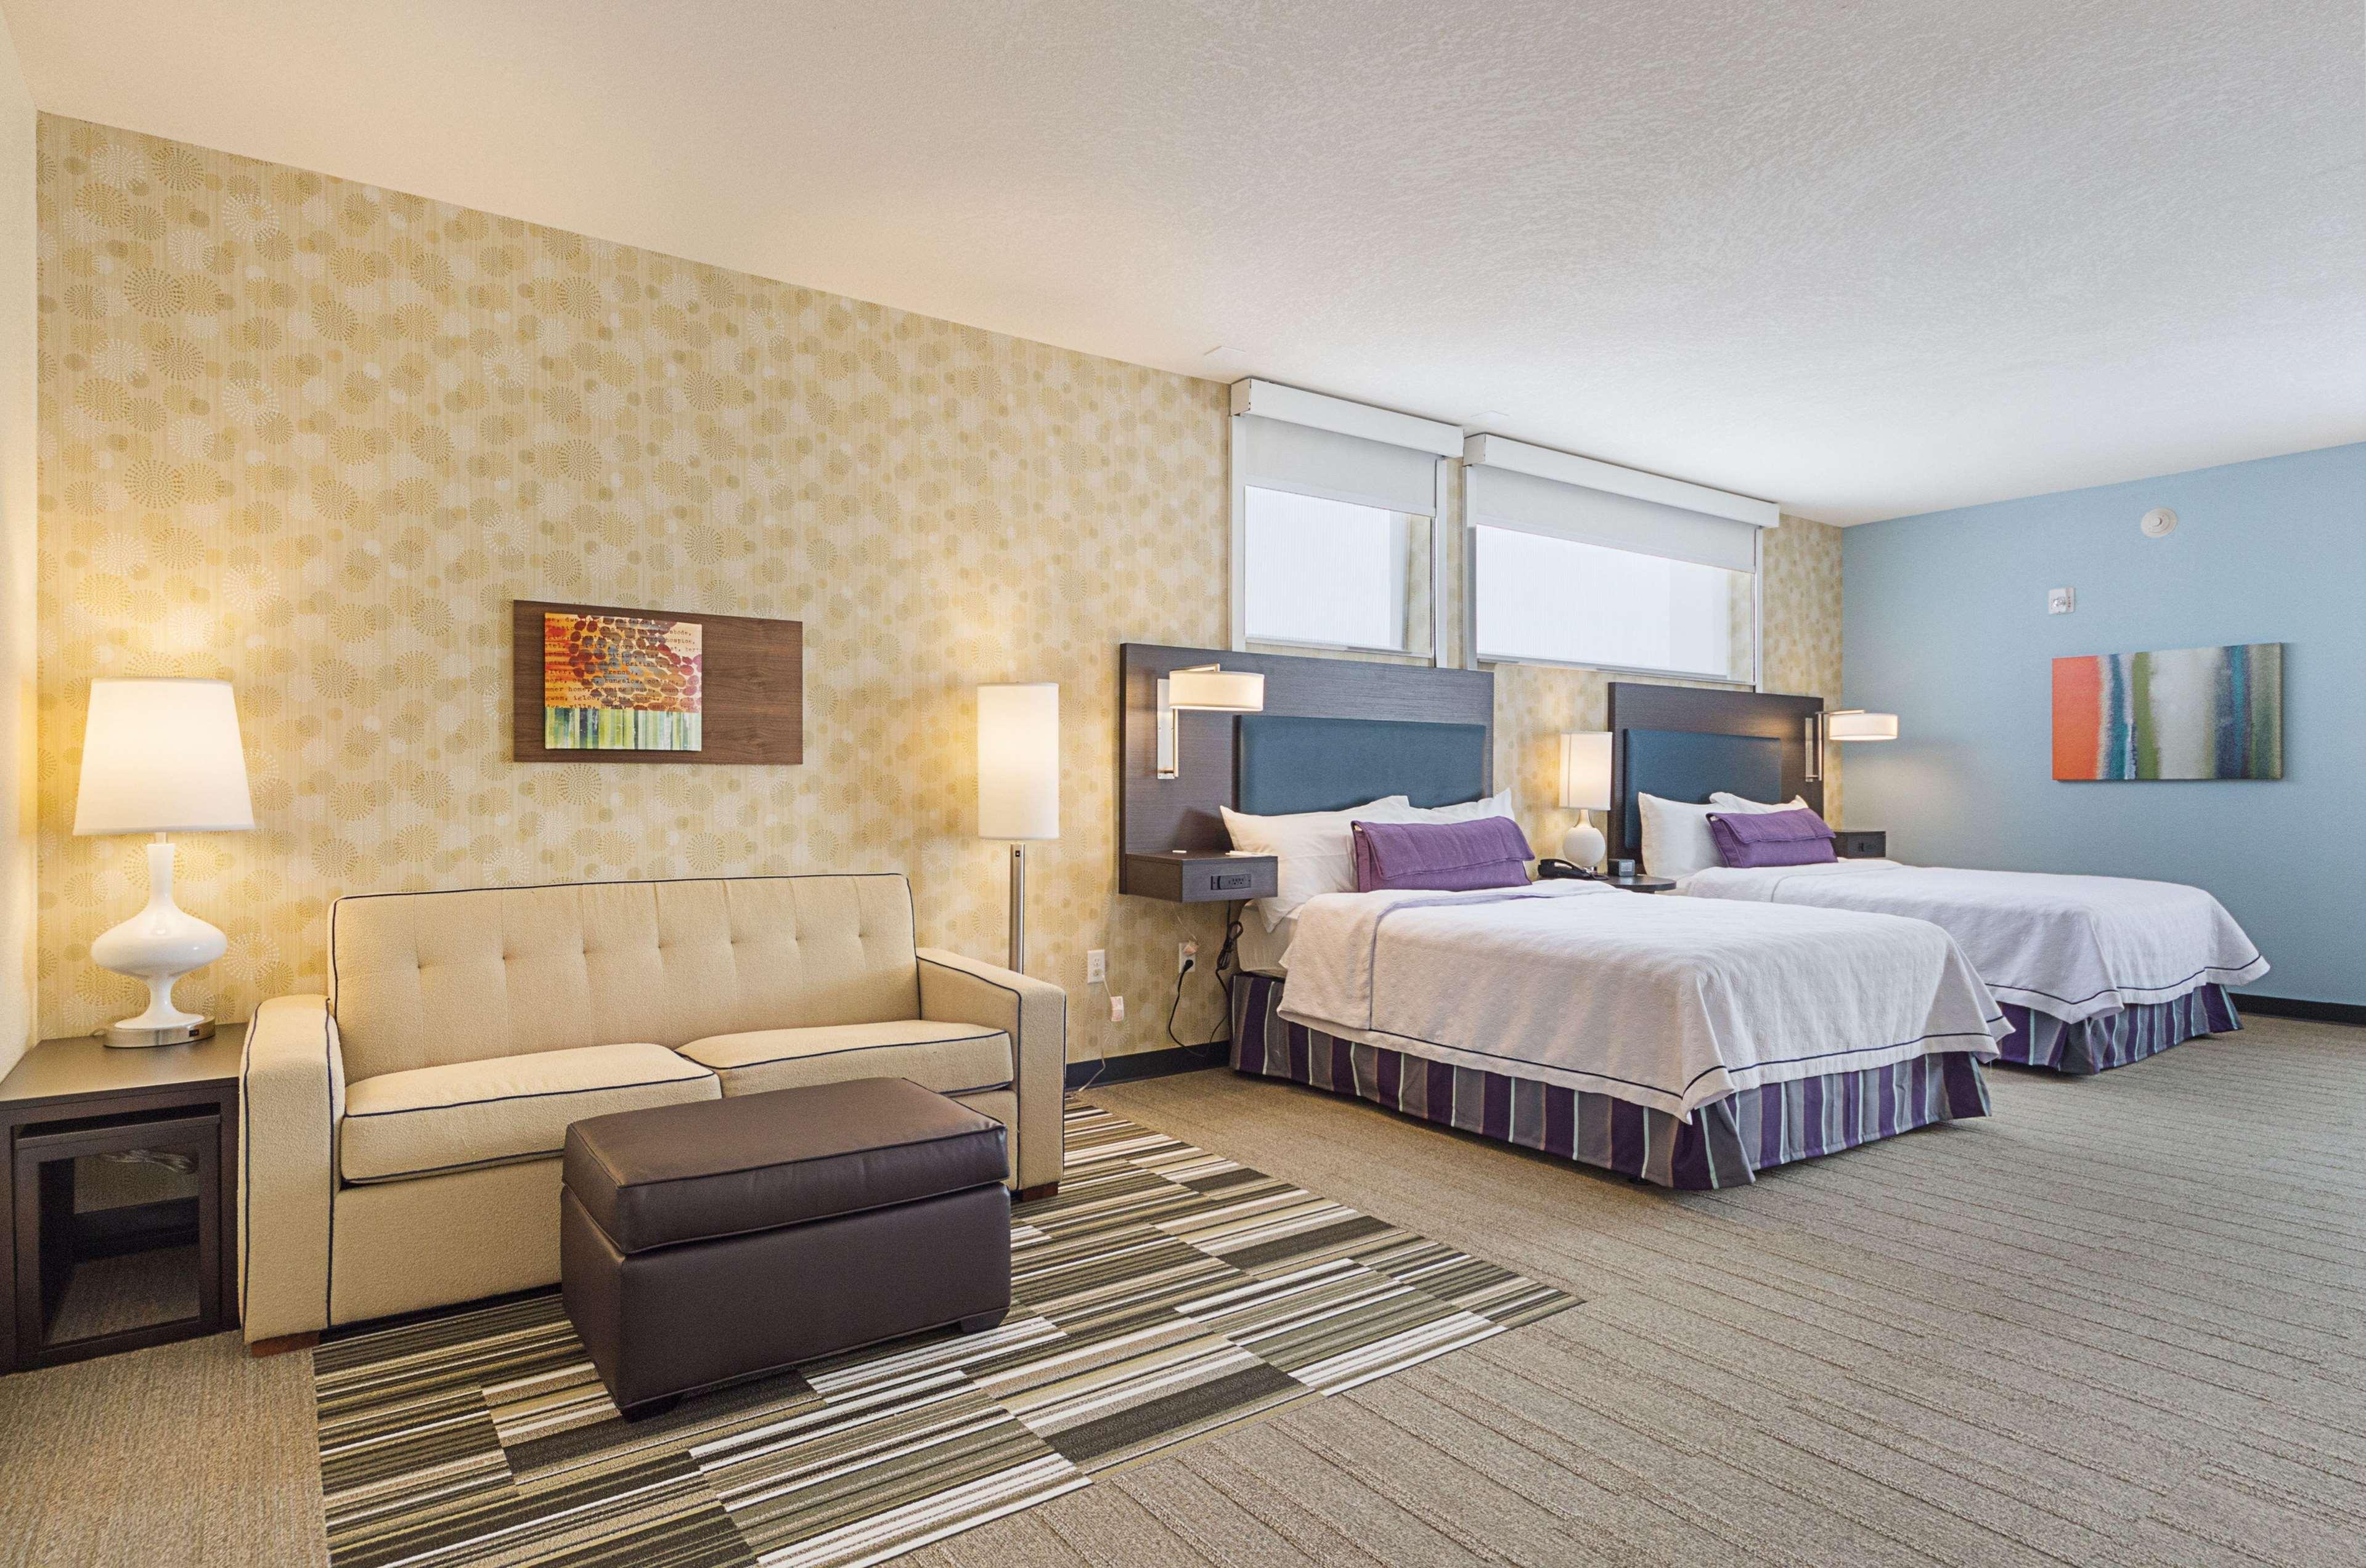 Home 2 Suites by Hilton - Yukon image 44